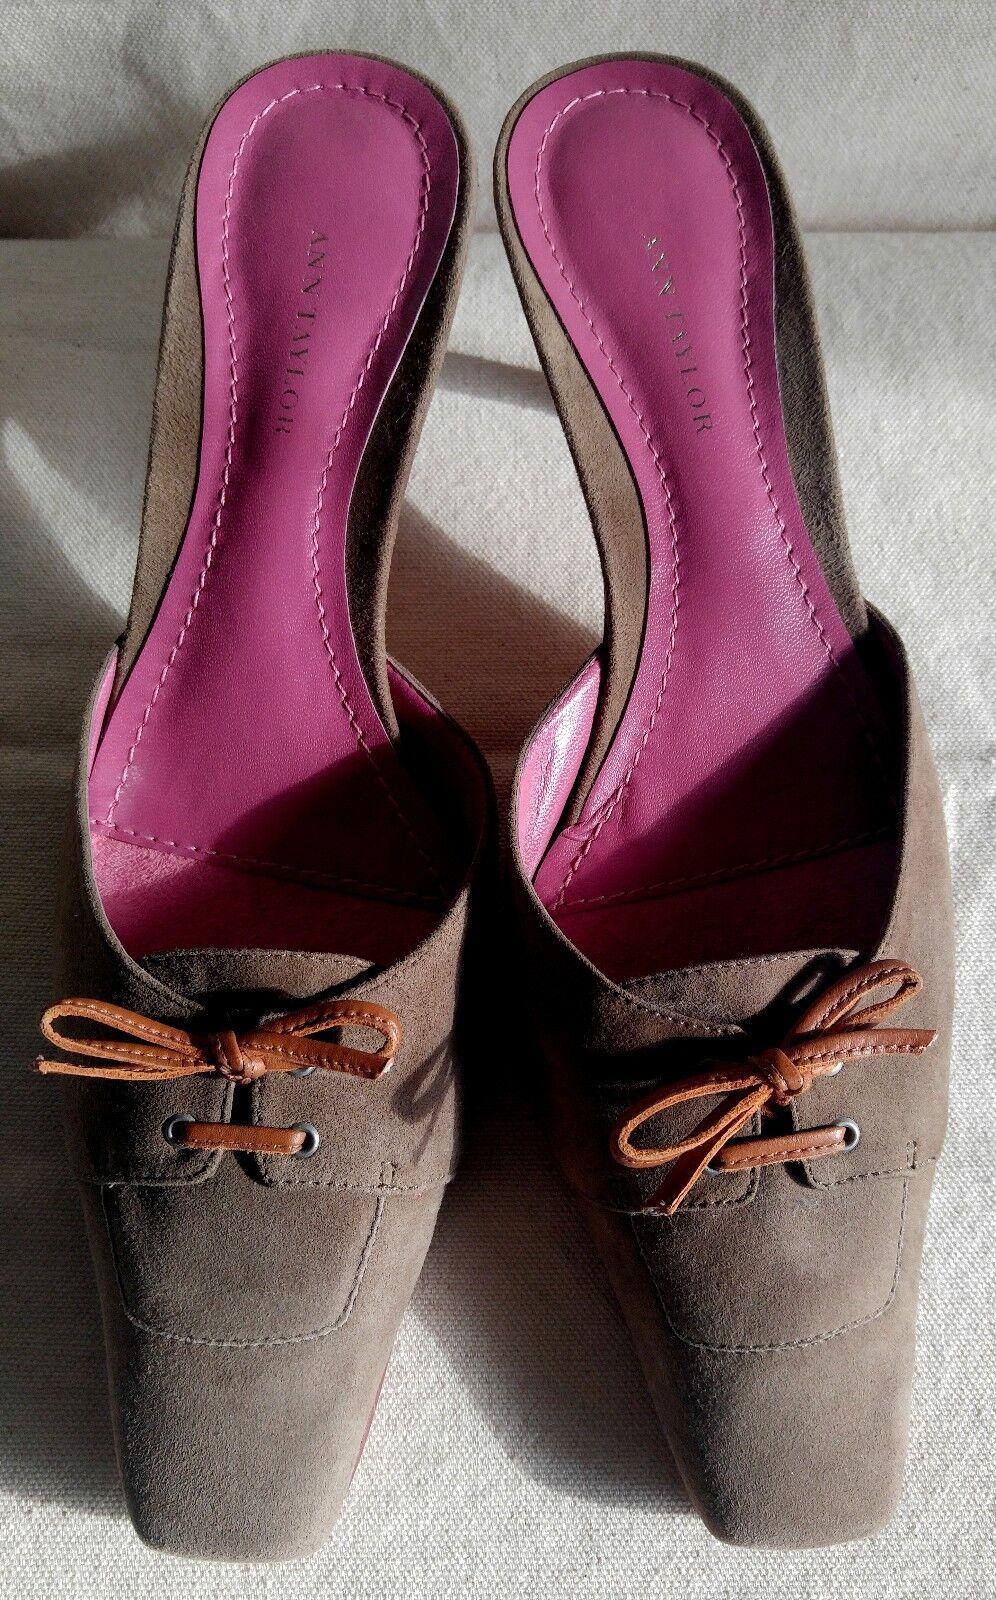 vendita all'ingrosso New ANN TAYLOR Pumps scarpe Tan Marrone Suede Suede Suede Leather Heels Sz 8.5 Slides  i nuovi marchi outlet online